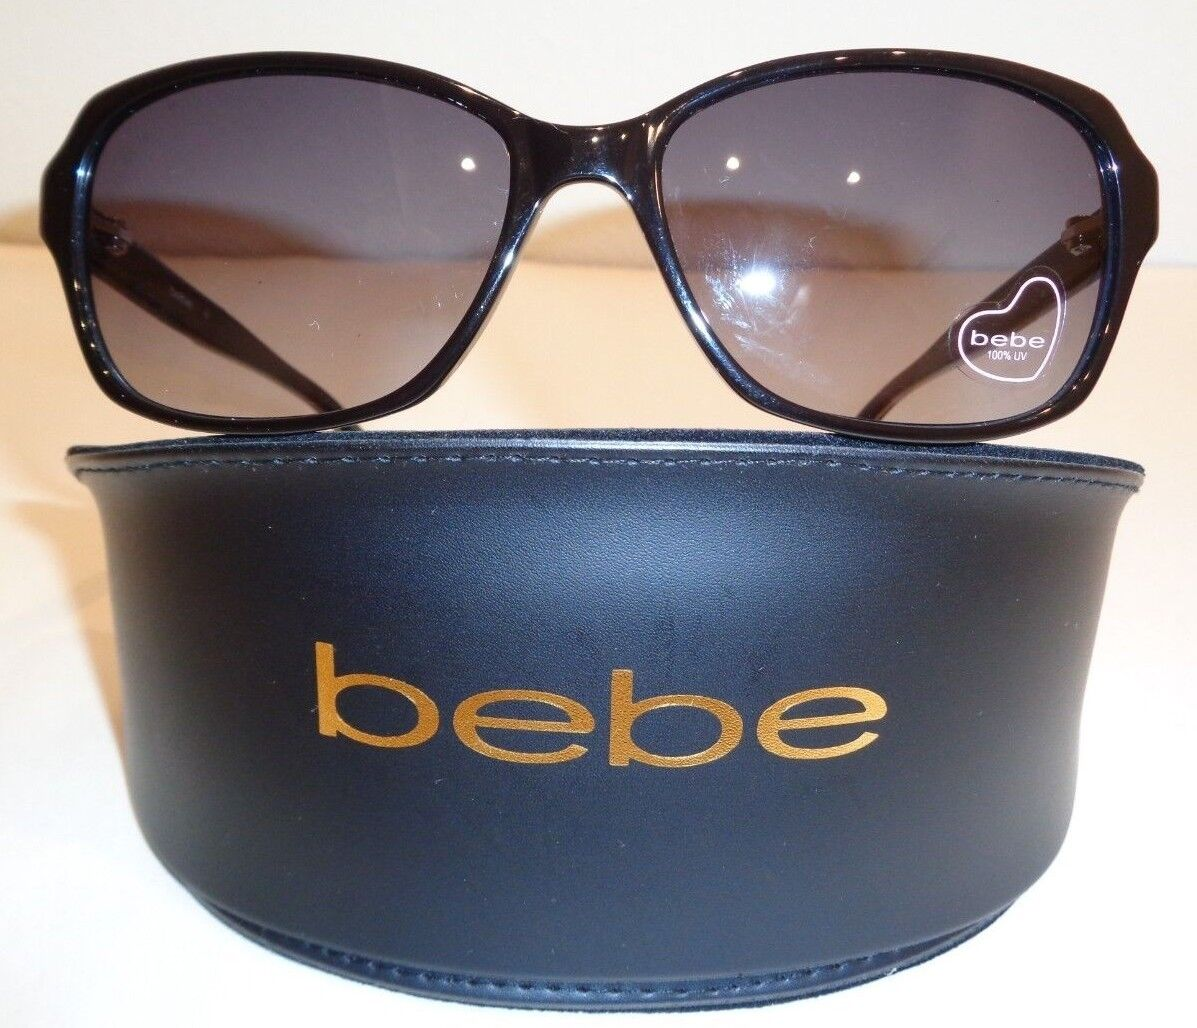 Bebe HUNGRY EYES BB7094 Jet Fashion Rectangular Sunglasses New Womens Eyewear